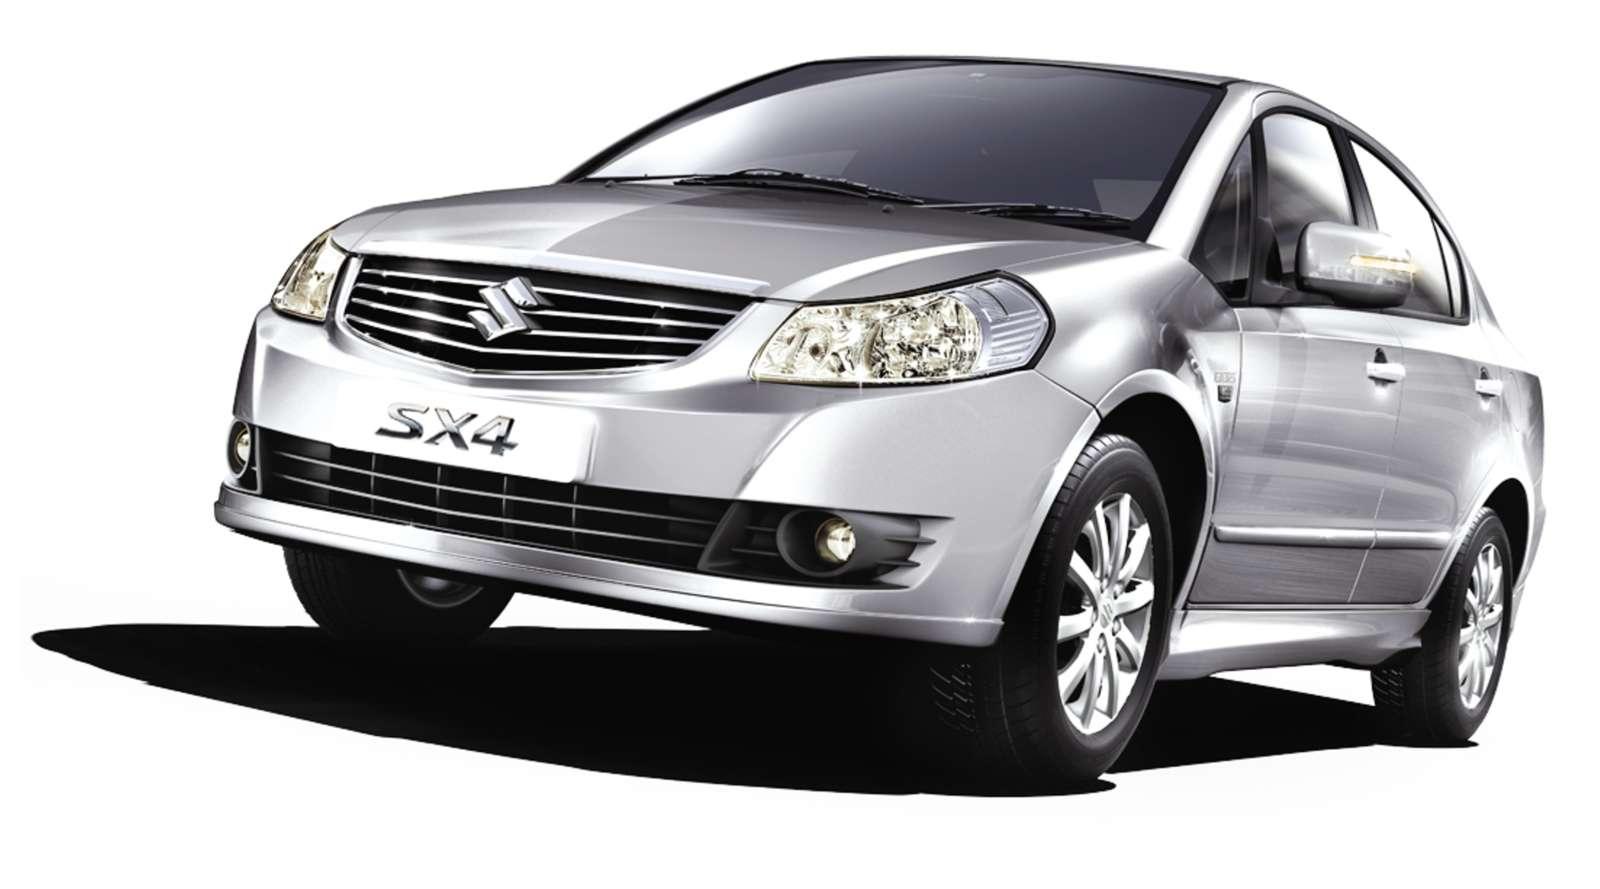 2013 maruti suzuki sx4 facelift 2